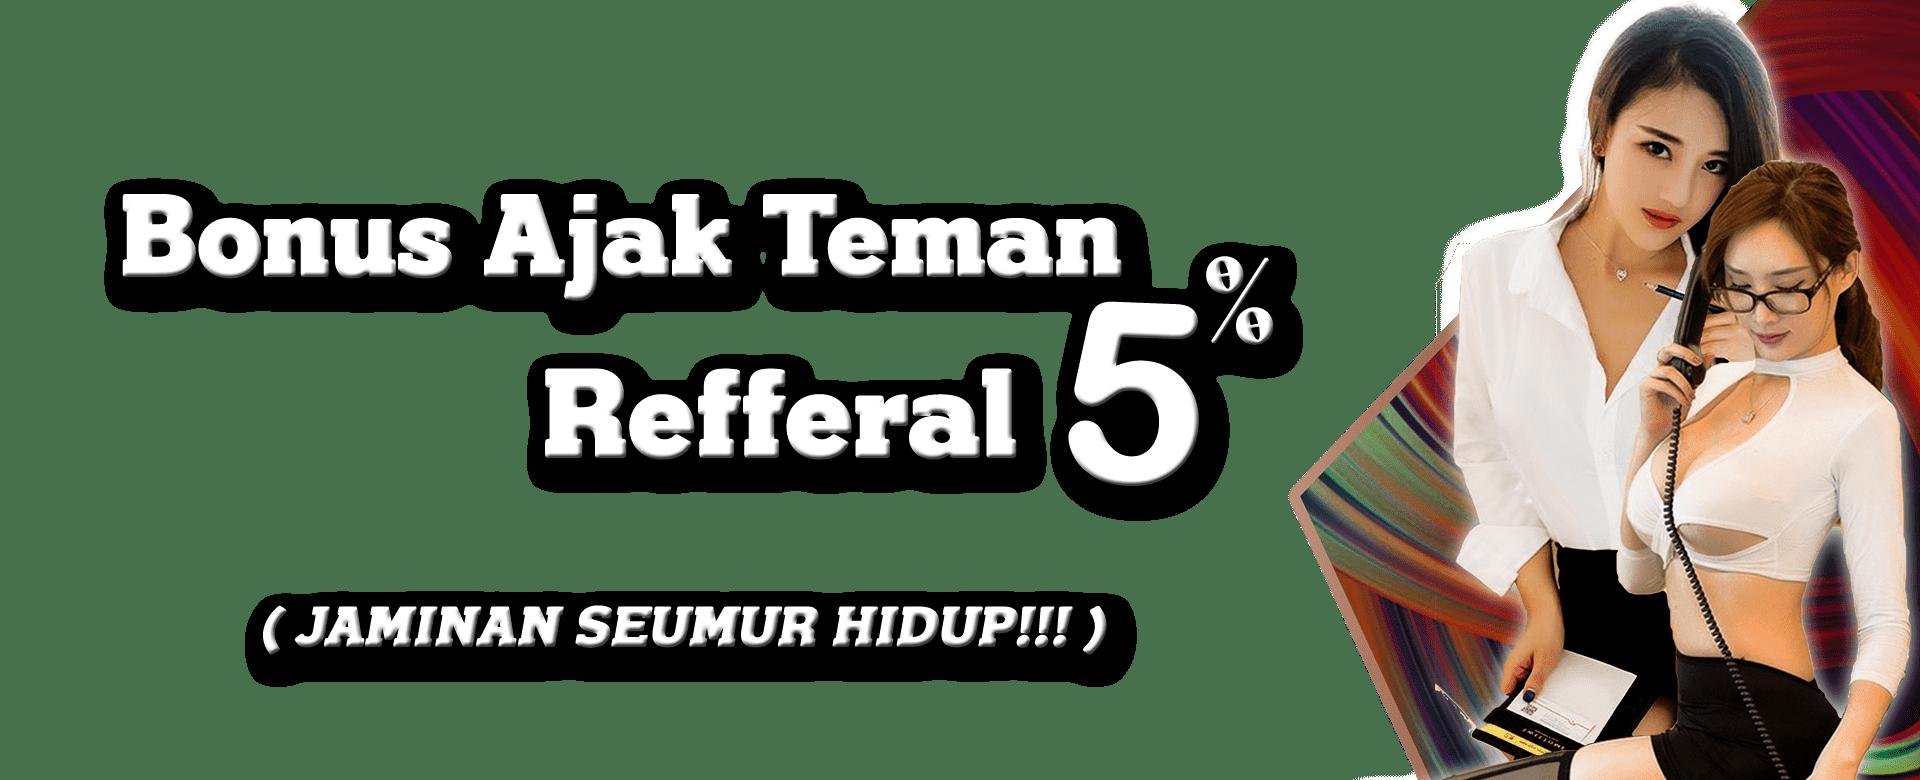 Situs Judi Online Terpercaya - Online303